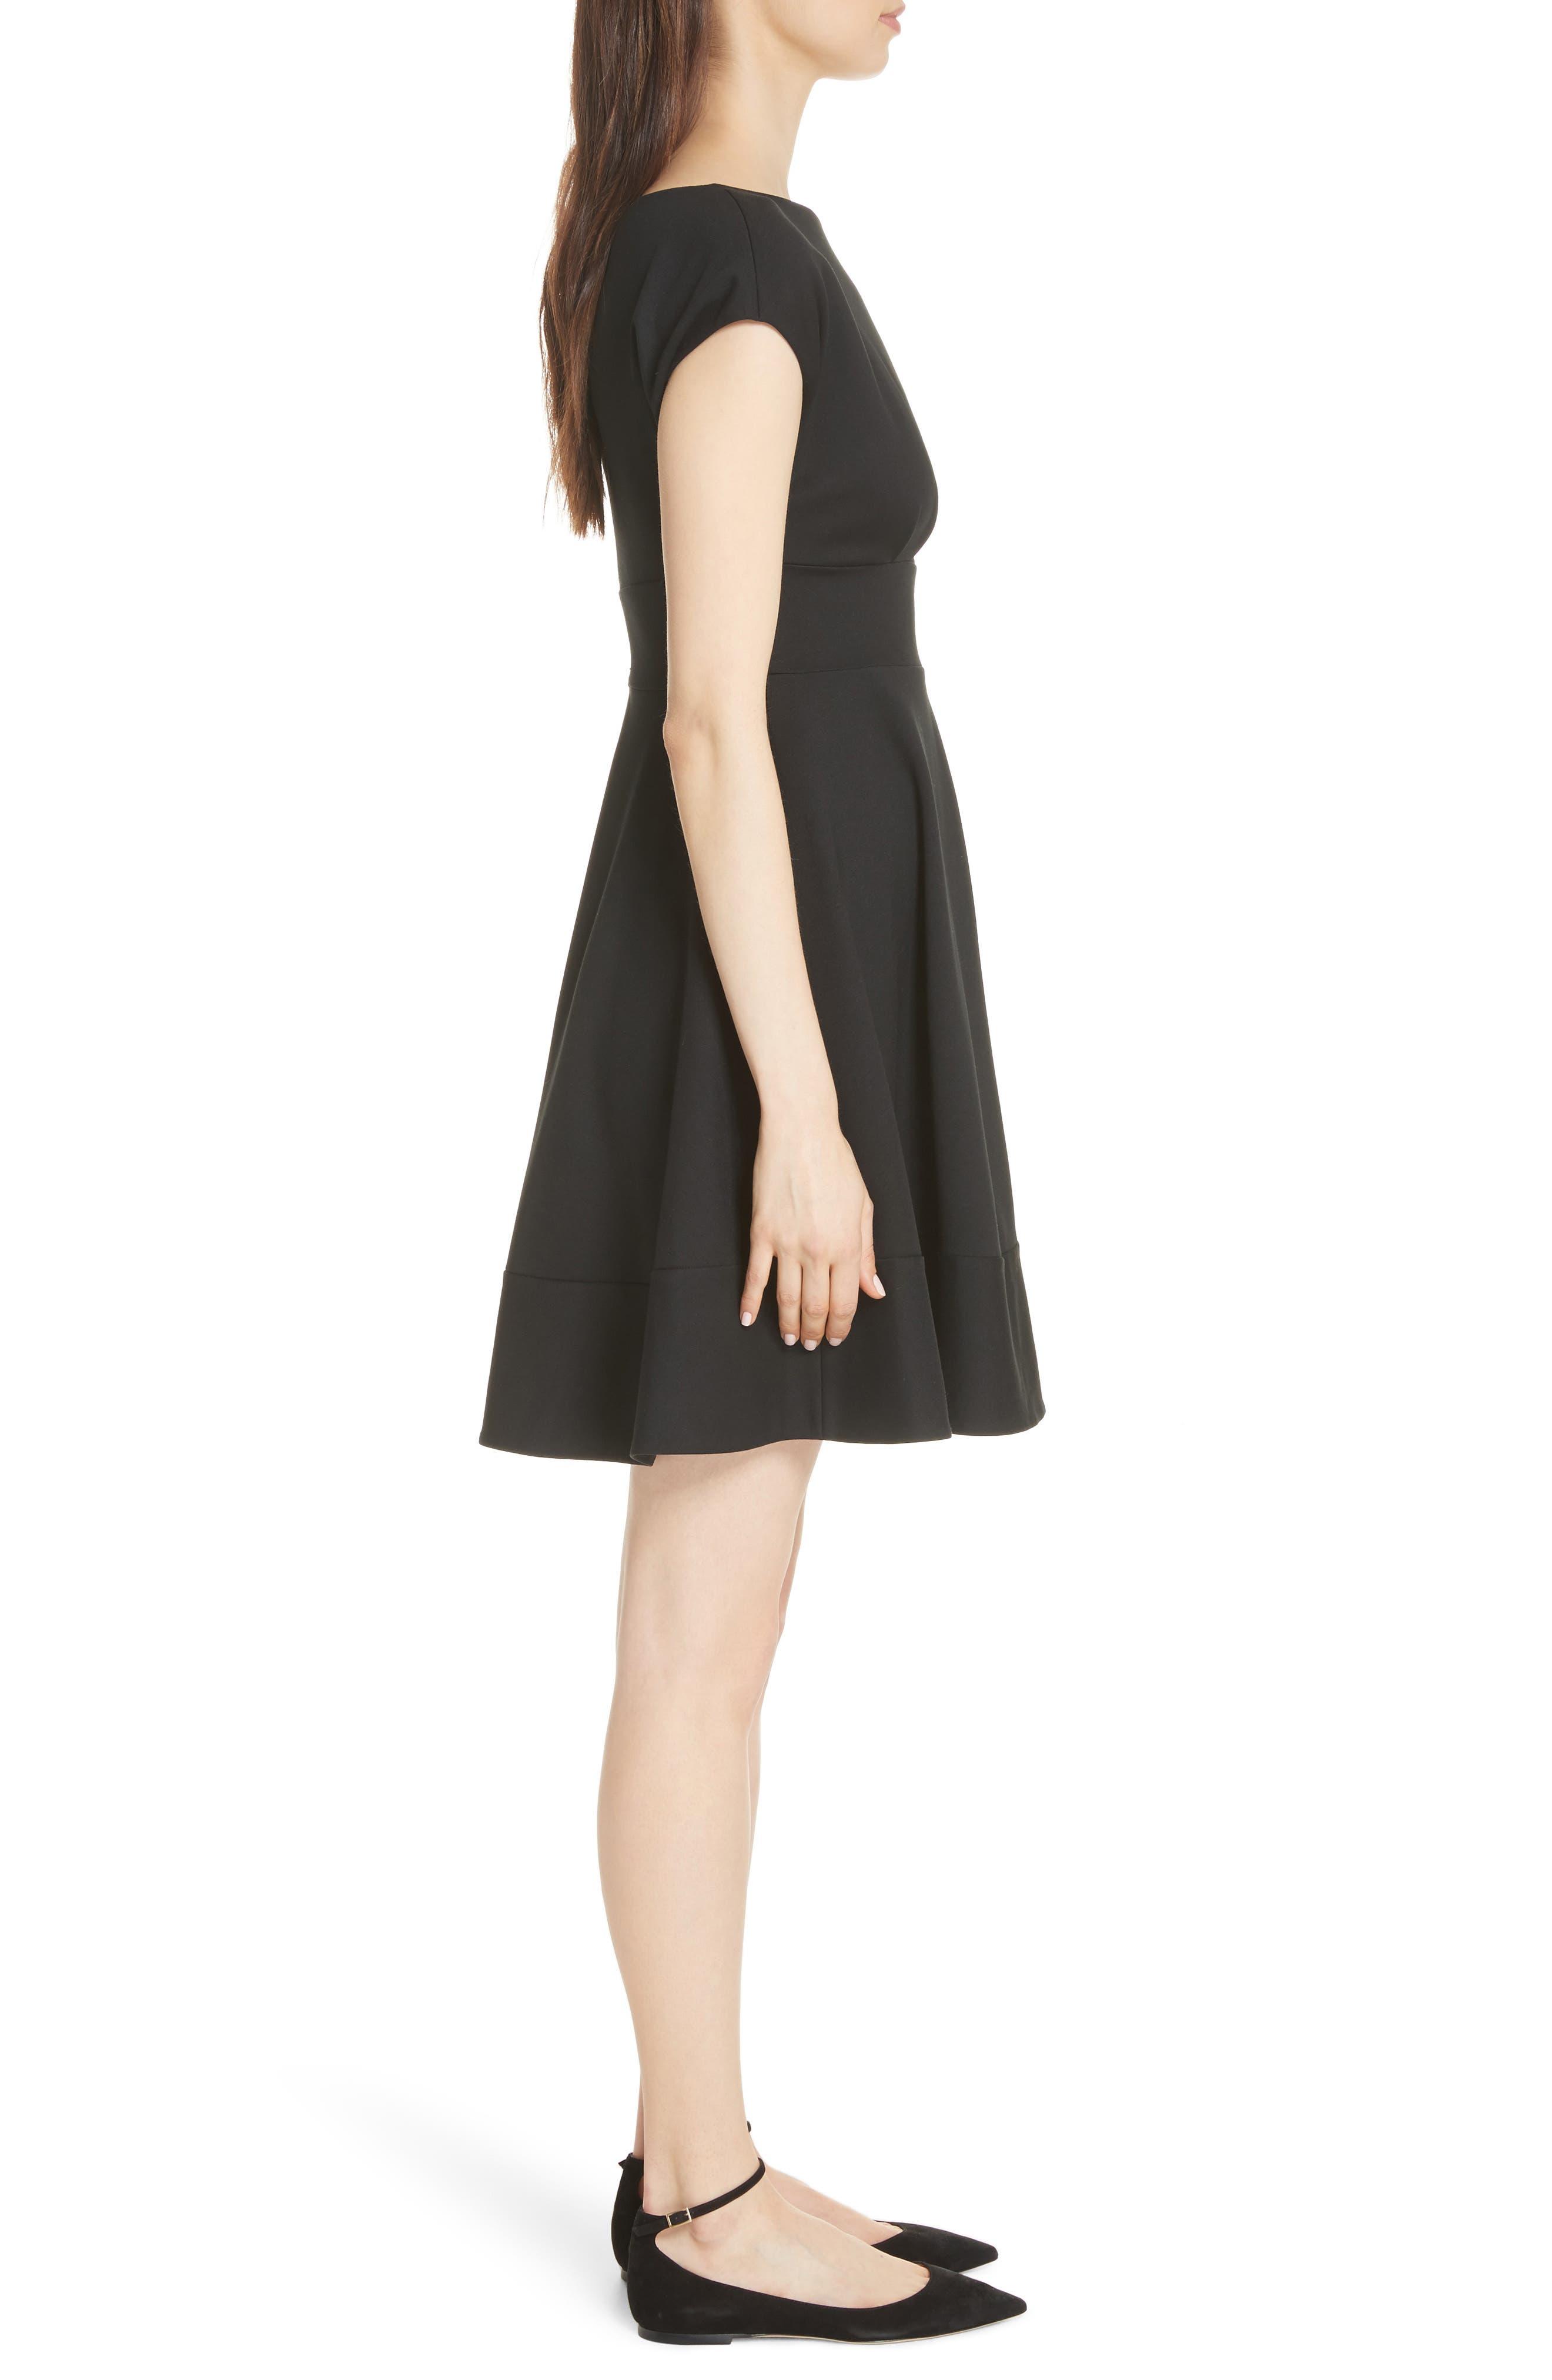 KATE SPADE NEW YORK,                             ponte fiorella fit & flare dress,                             Alternate thumbnail 3, color,                             BLACK